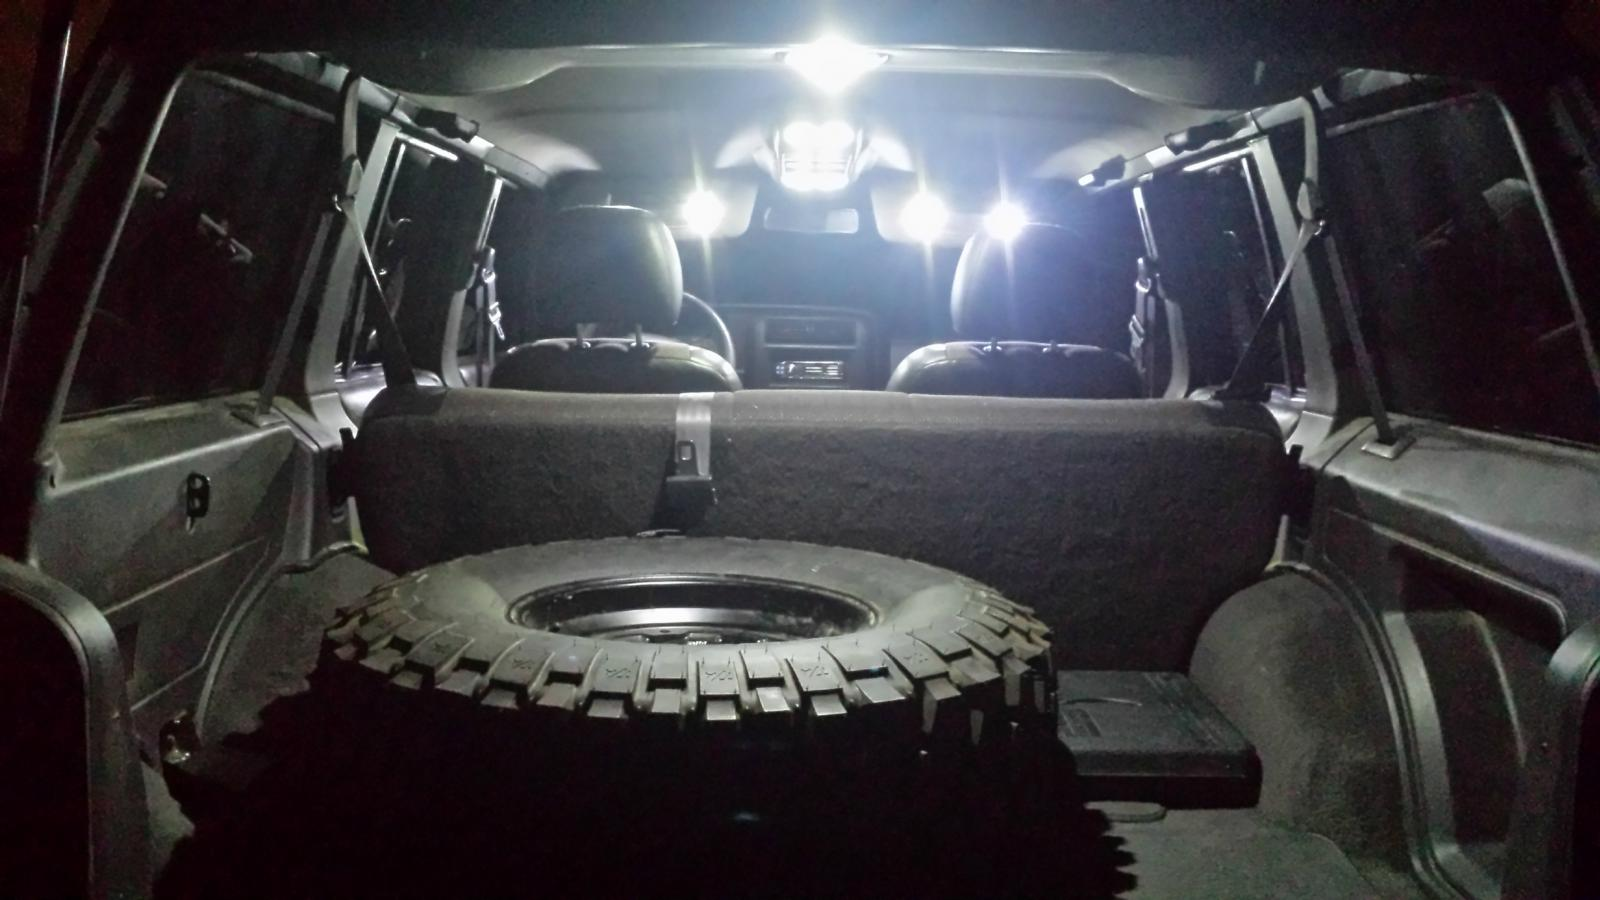 1997 2001 jeep cherokee xj interior led light set white w overhead console ebay for Jeep cherokee xj interior accessories